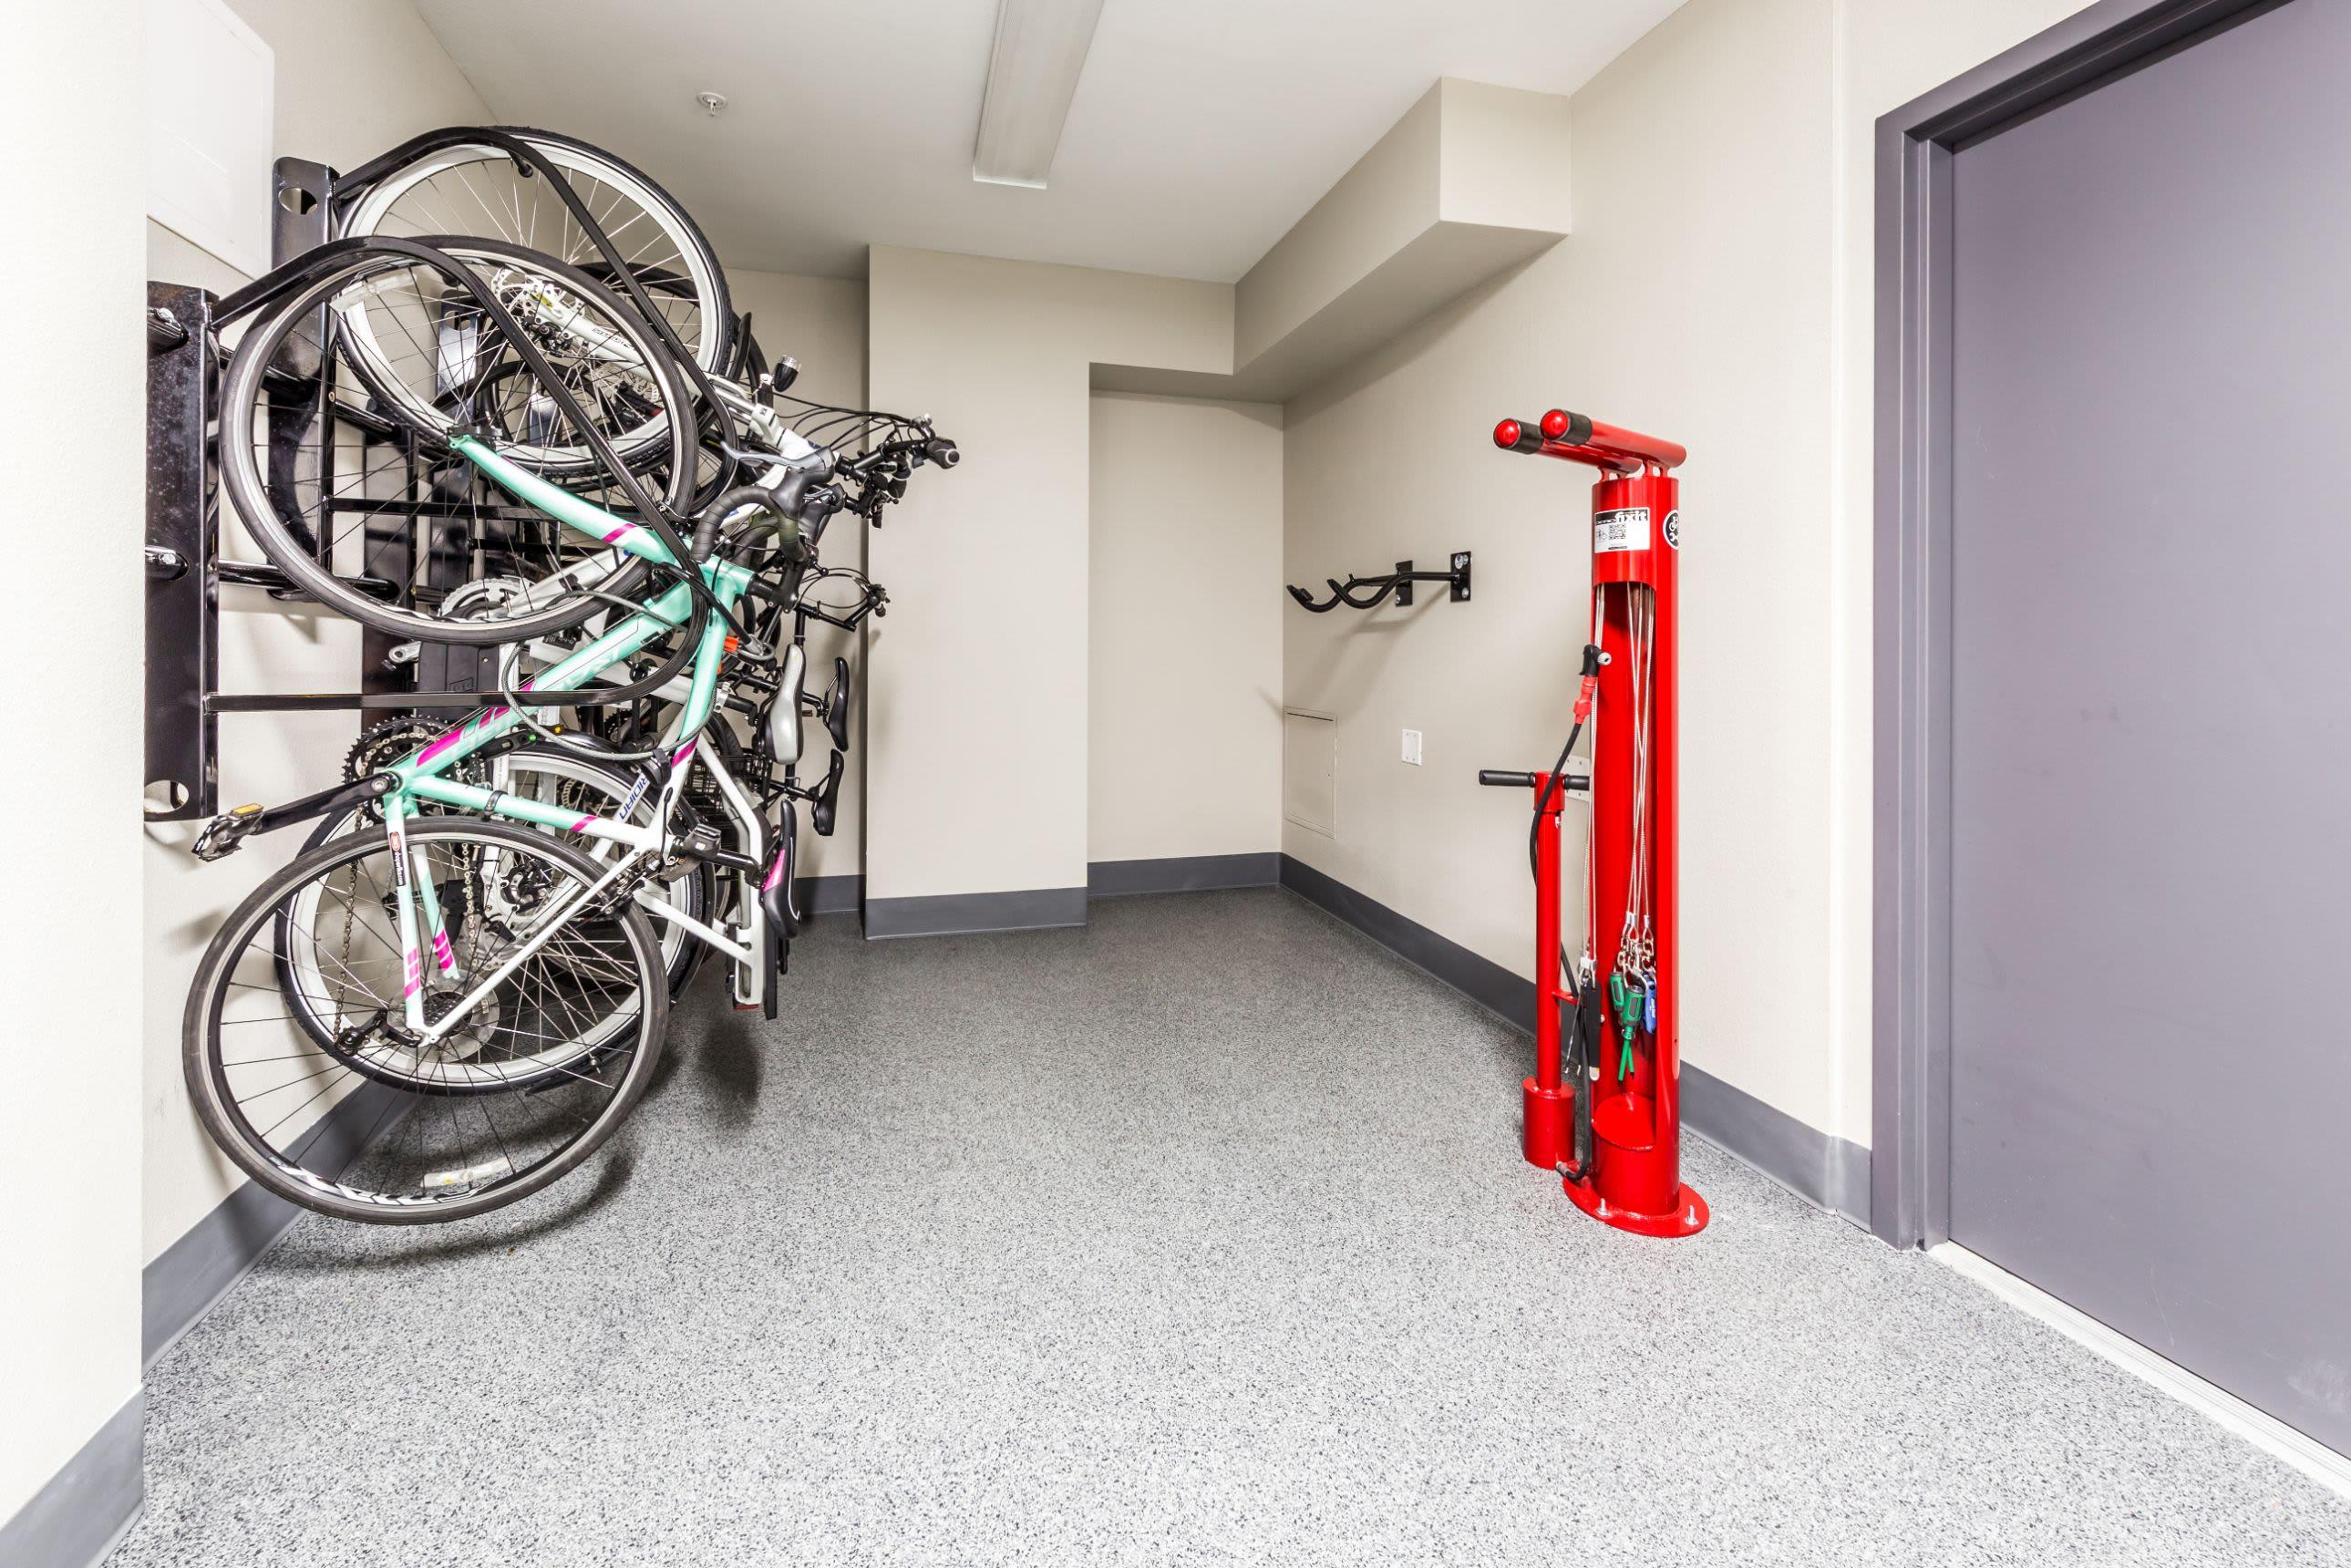 Bike storage at Marq 211 in Seattle, Washington